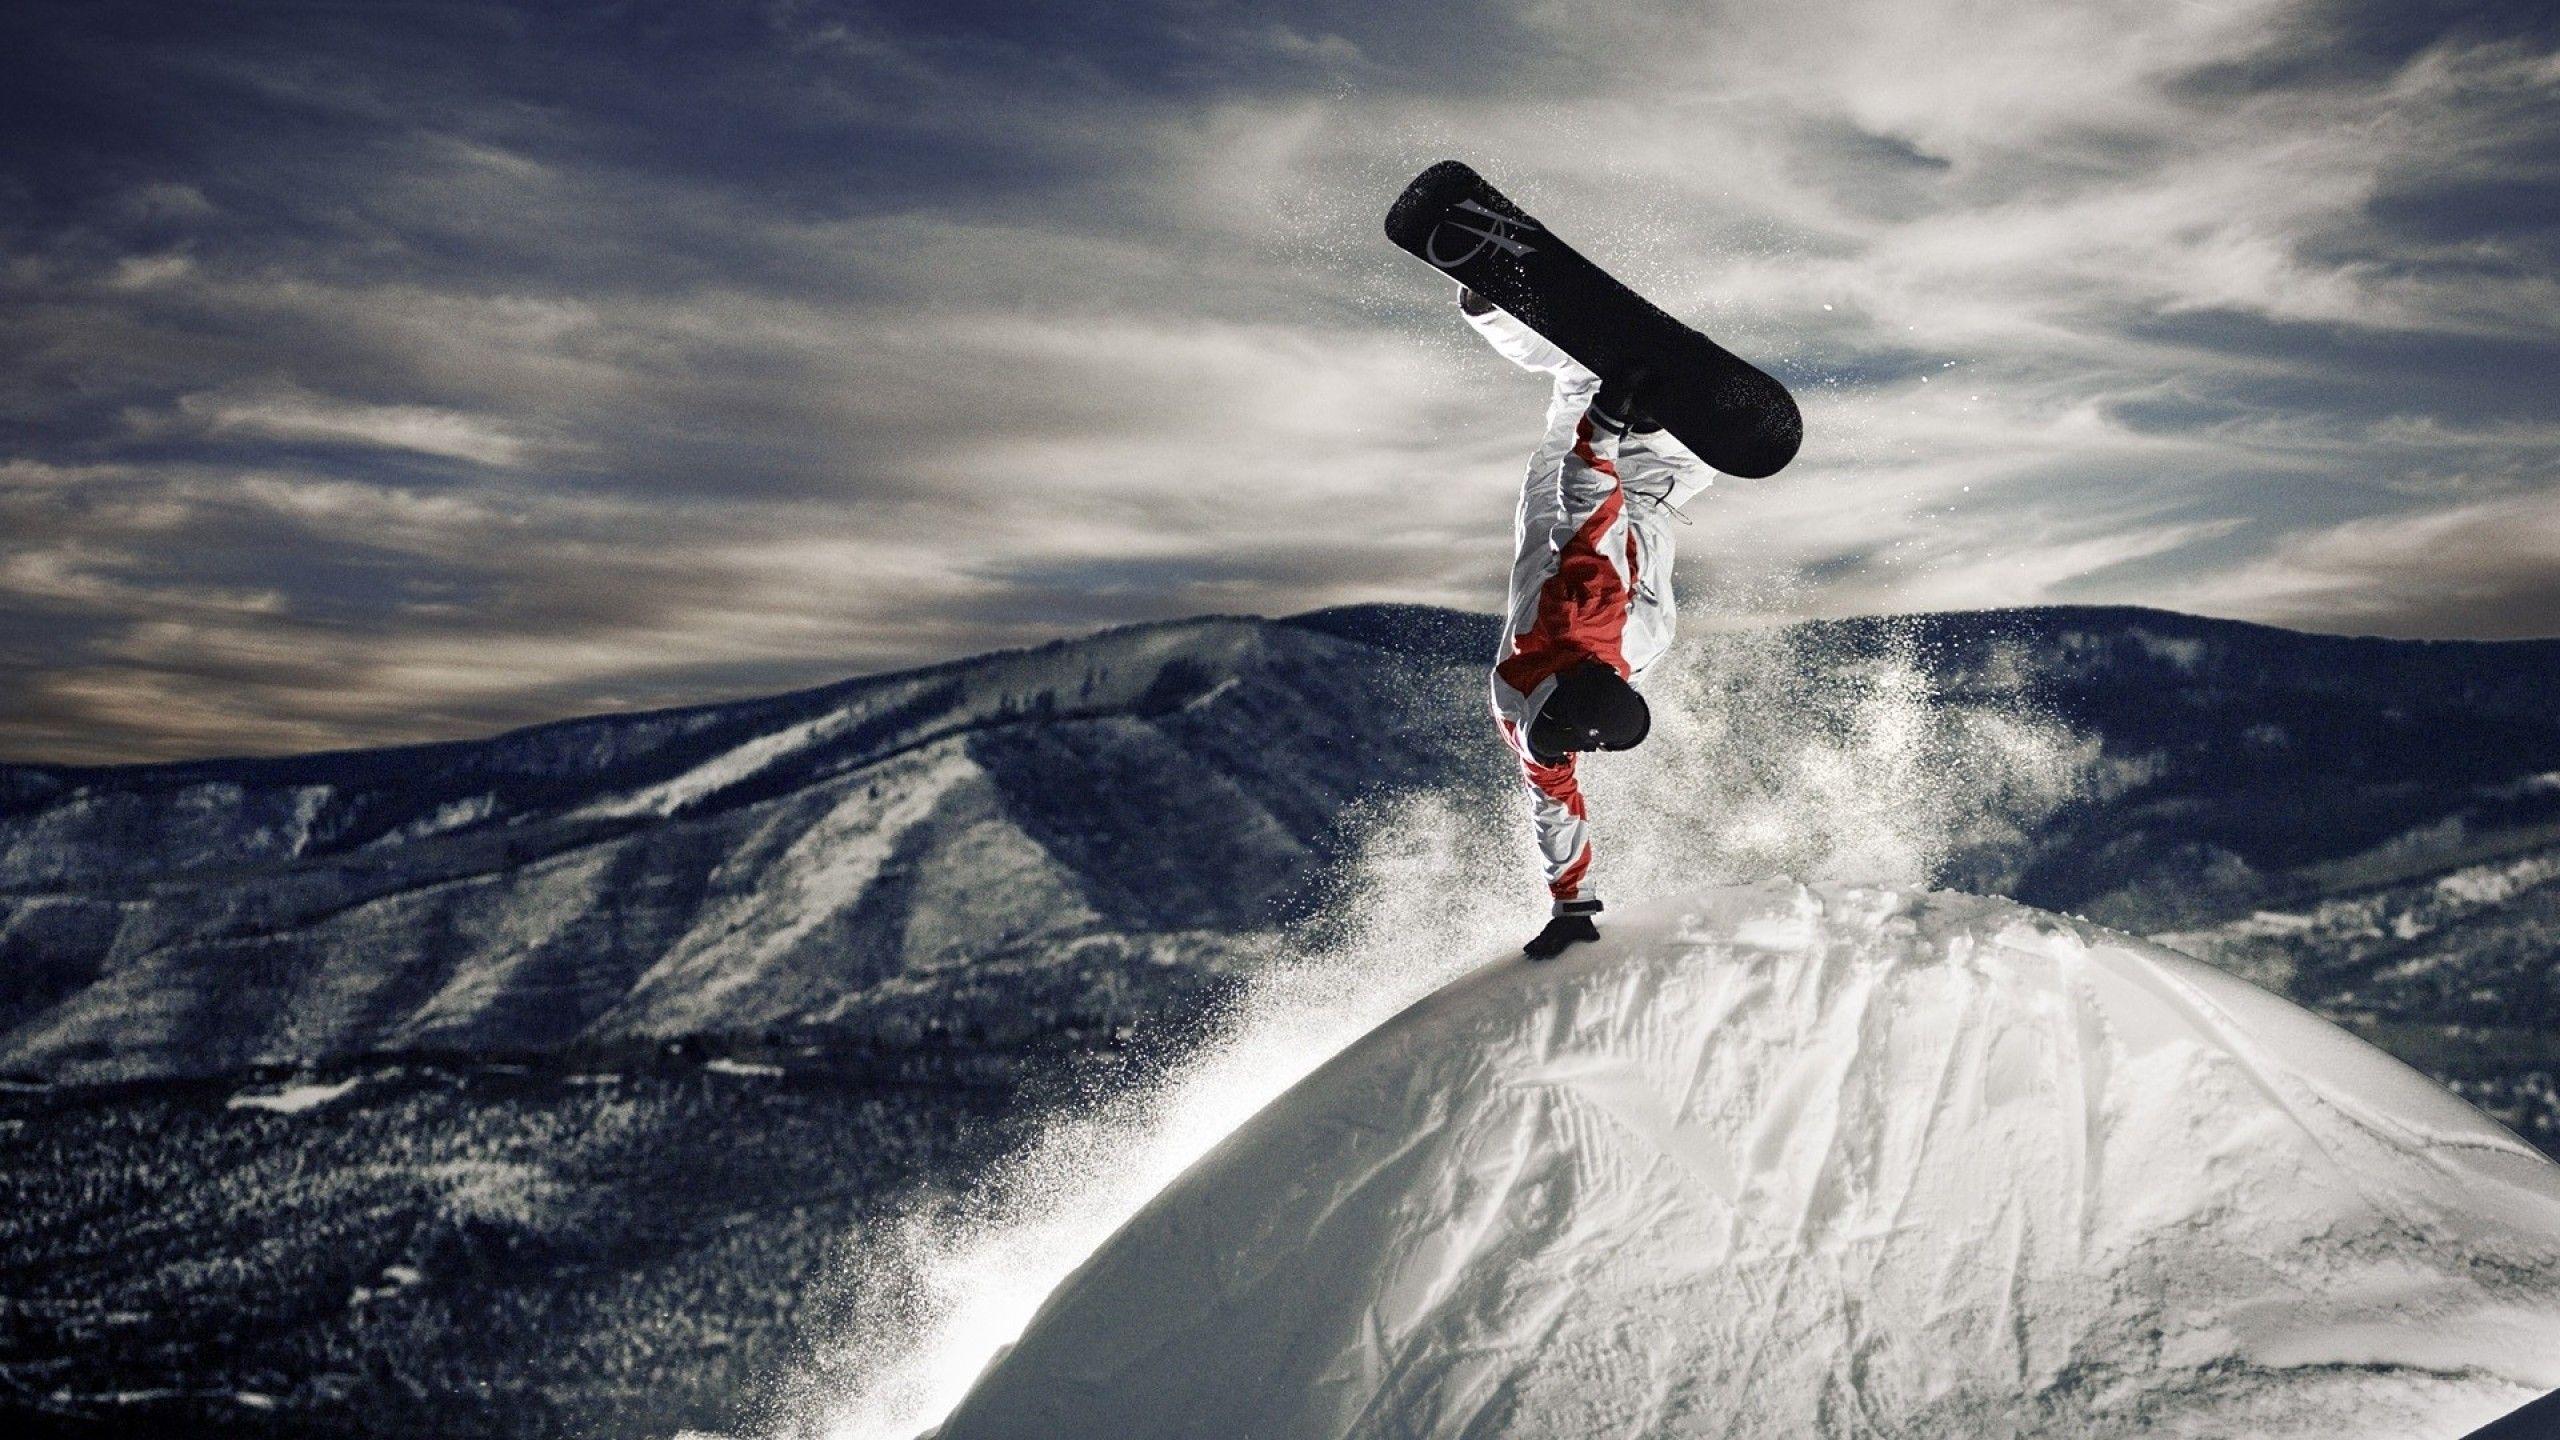 Download Wallpaper Snowboarder Stunt On Top Of A Mountain 2560x1440 Snowboarding Snowboarding Wallpaper Snowboard